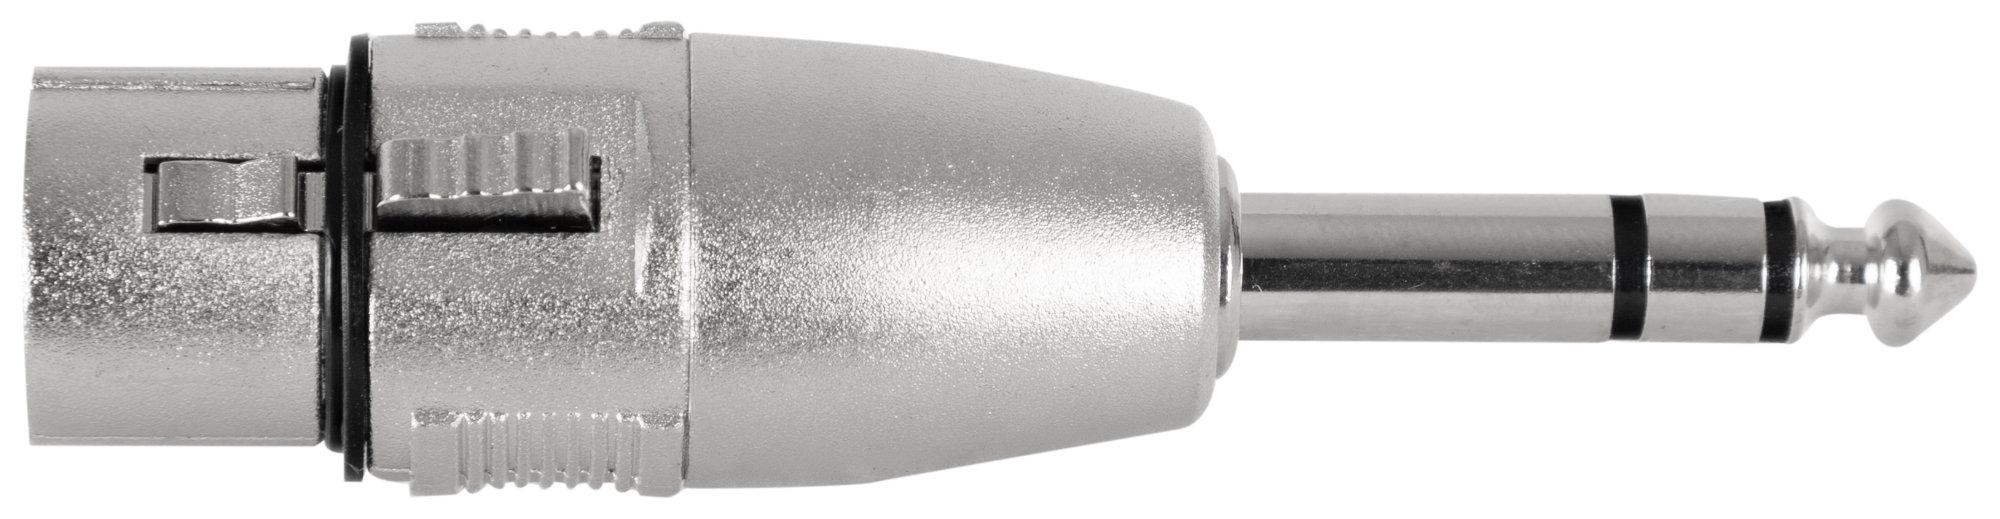 Kabelmulticores - Pronomic AD JSXF Adapter 6,3mm Stereo Klinke male | XLR female - Onlineshop Musikhaus Kirstein